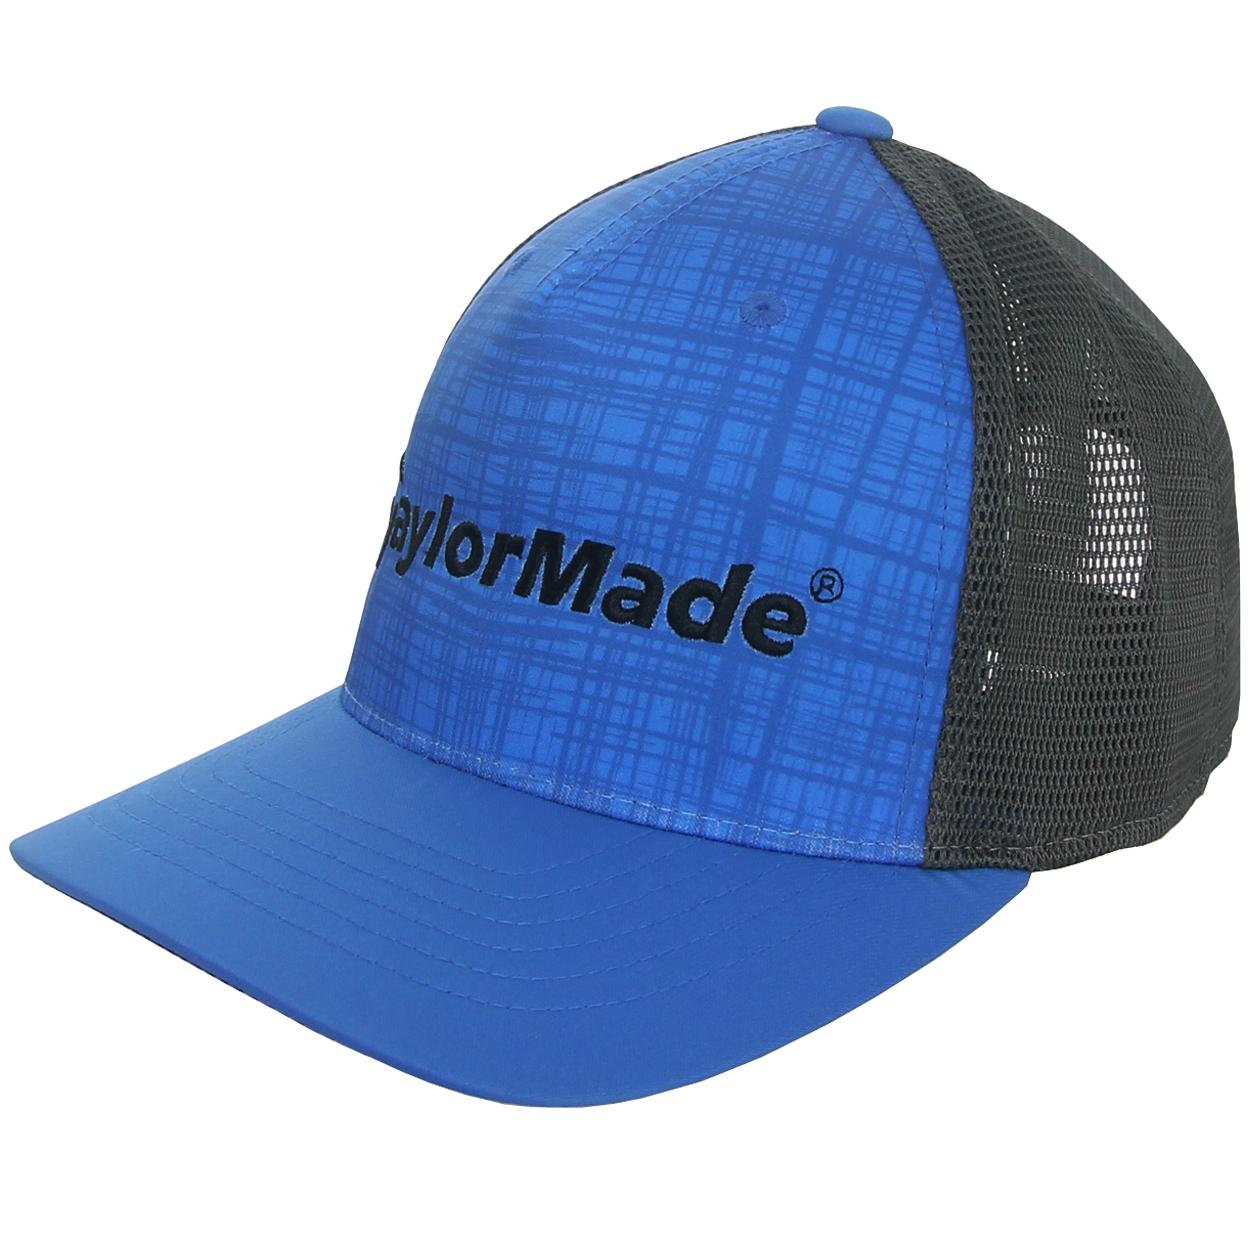 TaylorMade Adidas ClimaCool Flexfit Tech 110 Snapback Mesh Hat ... 8f69ecd3372